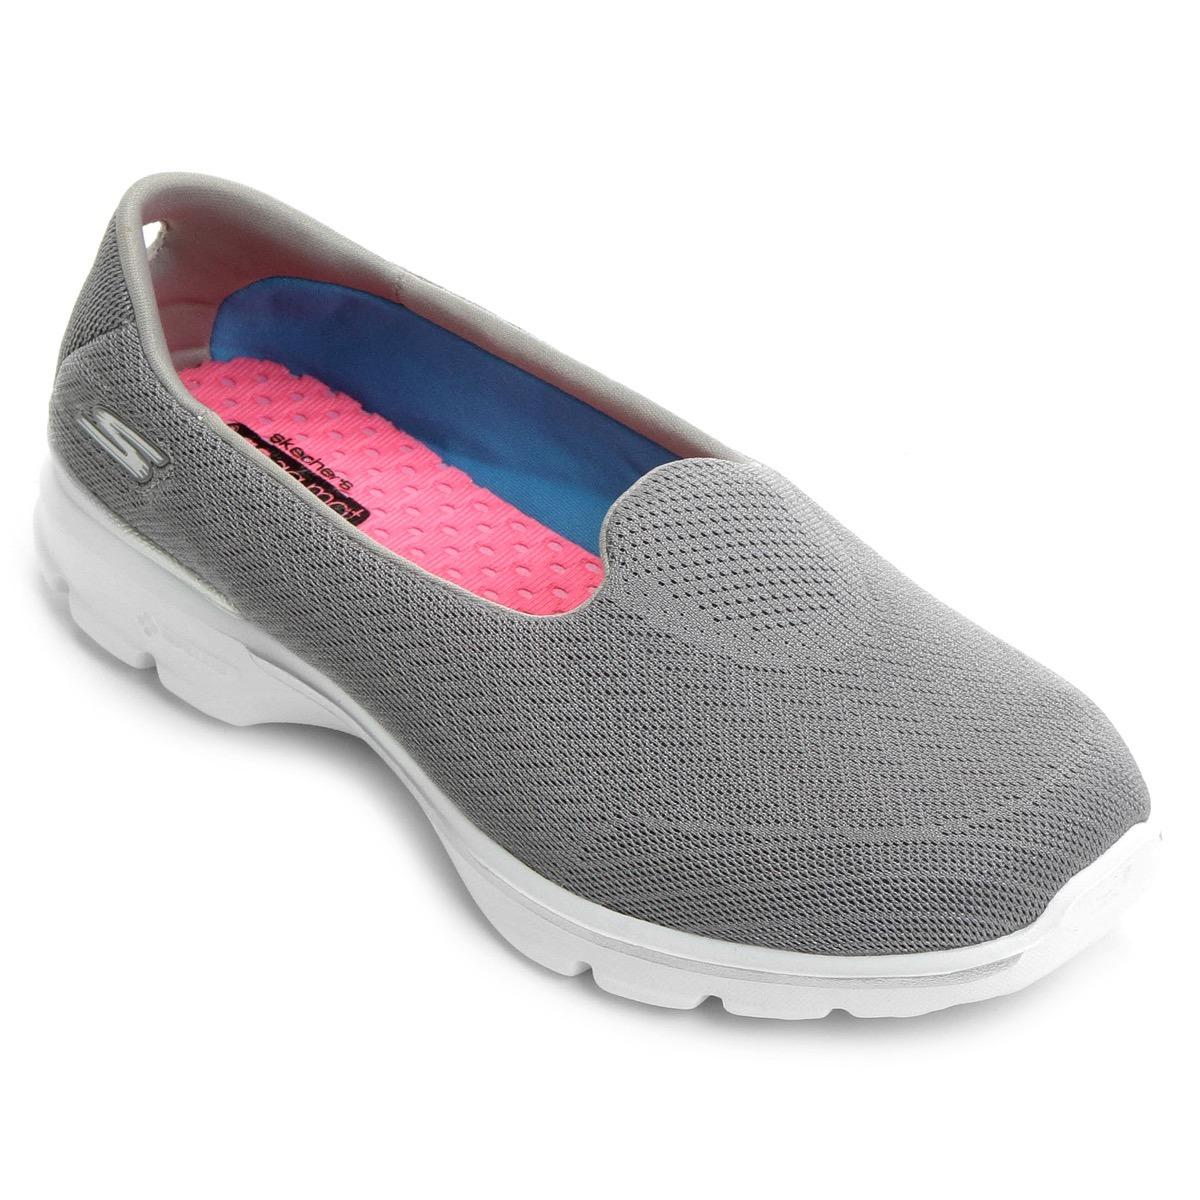 48ded6277 tênis sapatilha skechers go walk 3 insight cinza feminino. Carregando zoom.